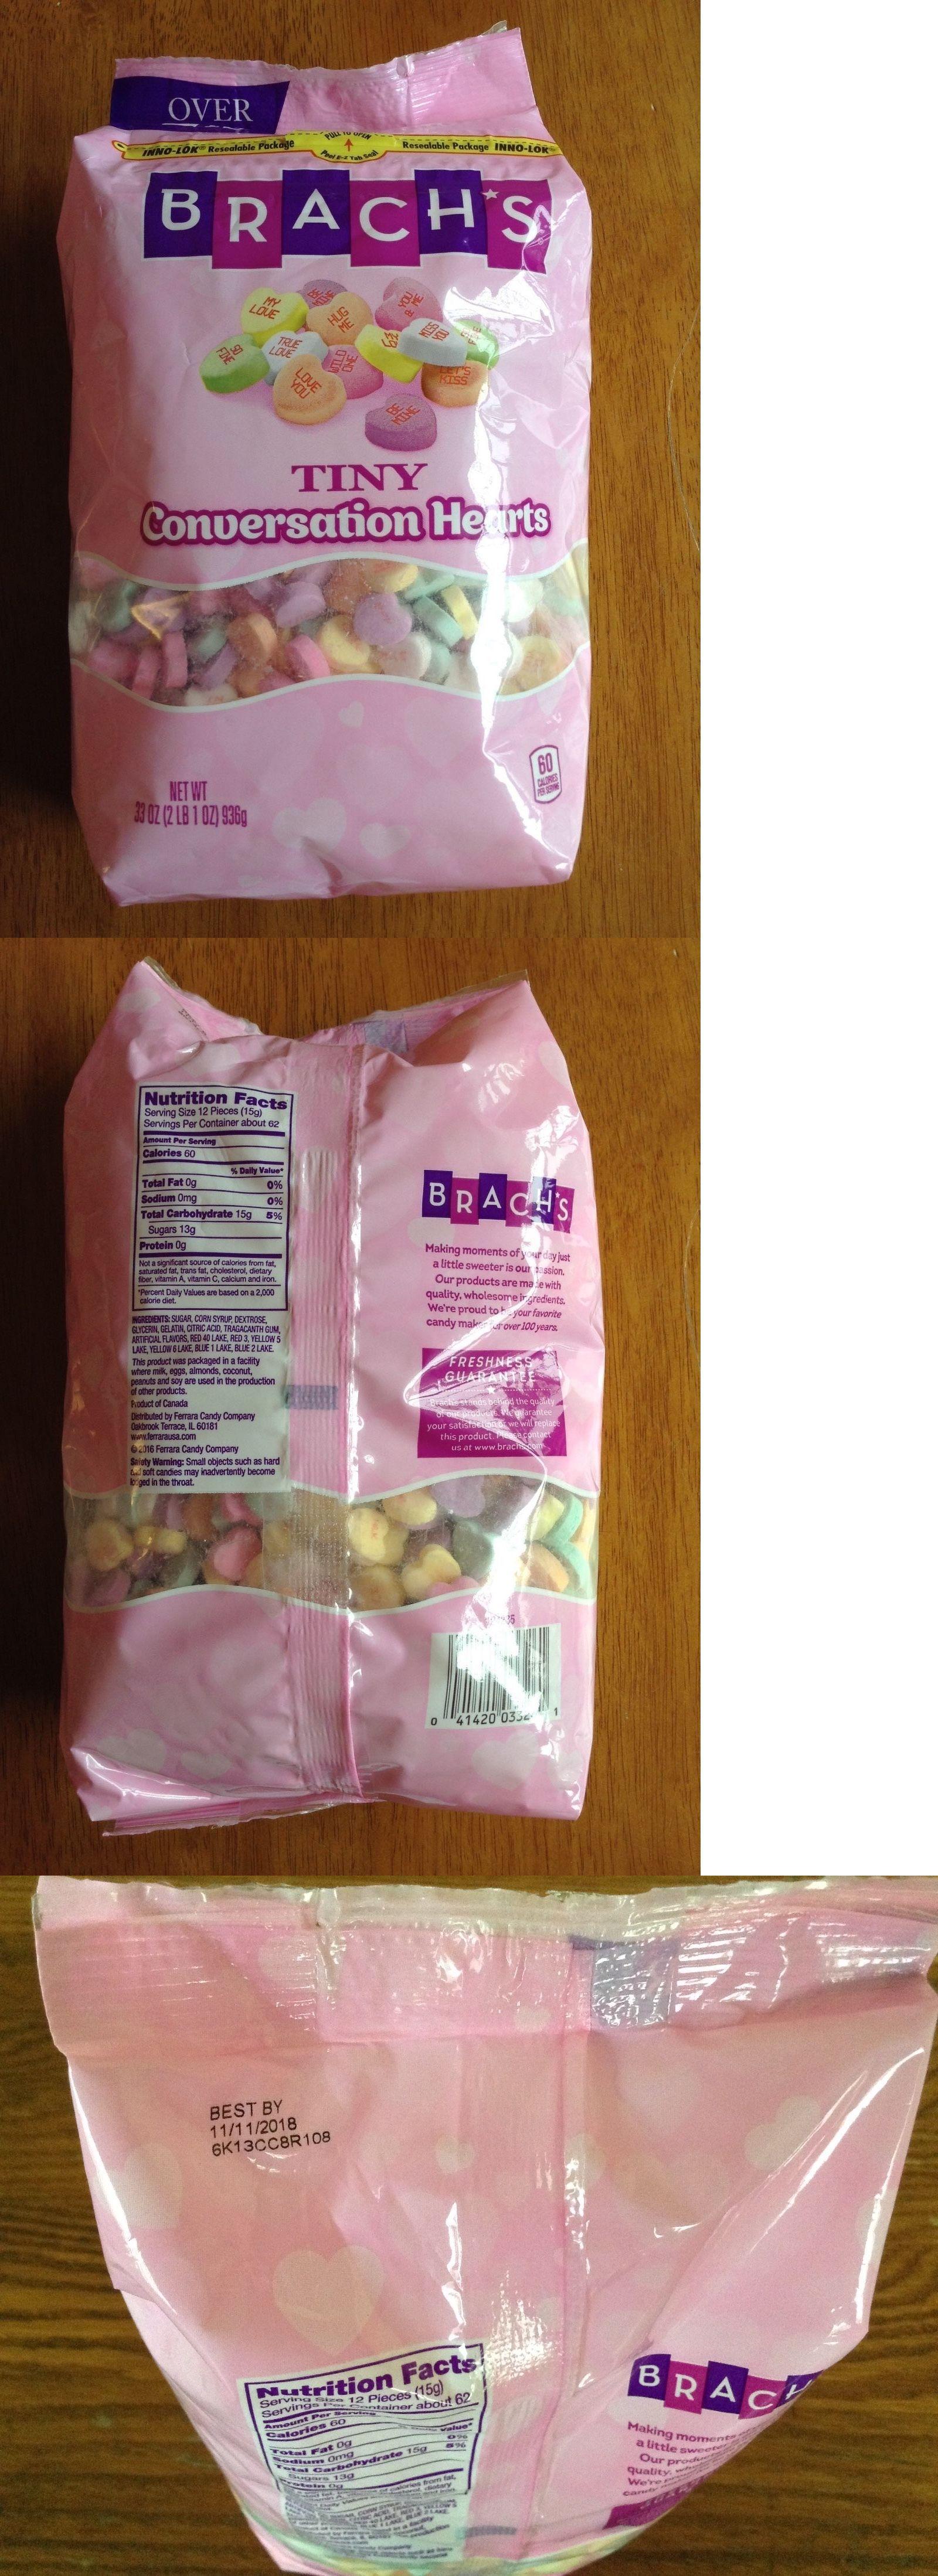 Seasonal Candy 38177: Brach S Big Bag Tiny Conversation Candy Hearts 33 Oz 2 Lbs Wedding Love -> BUY IT NOW ONLY: $34.99 on eBay!